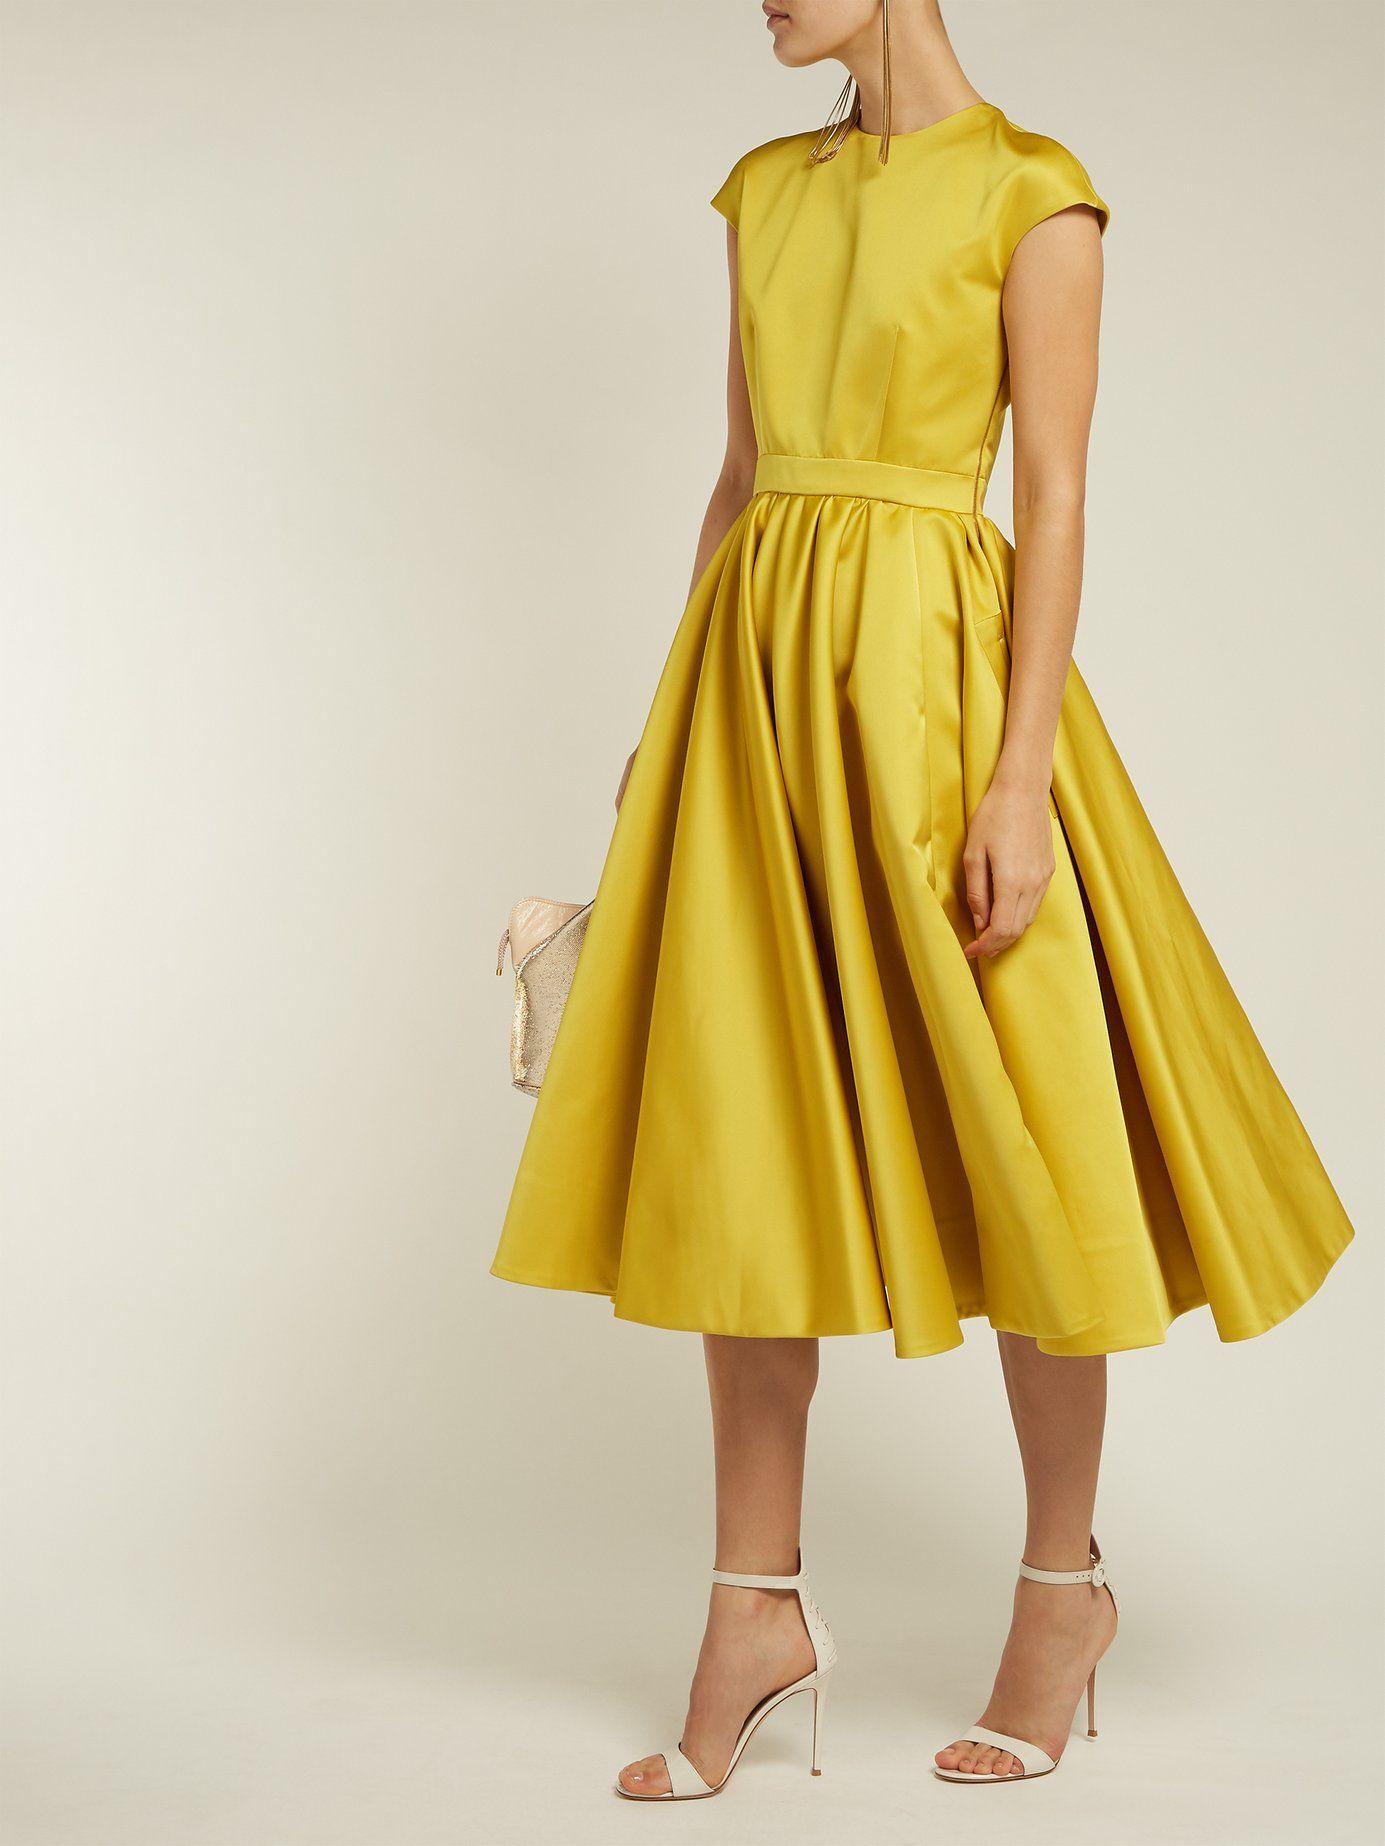 Rochas Duchess Satin Midi Bumblebee Yellow Dress We Select Dresses Yellow Dress Satin Midi Dress Select Dress [ 1846 x 1385 Pixel ]